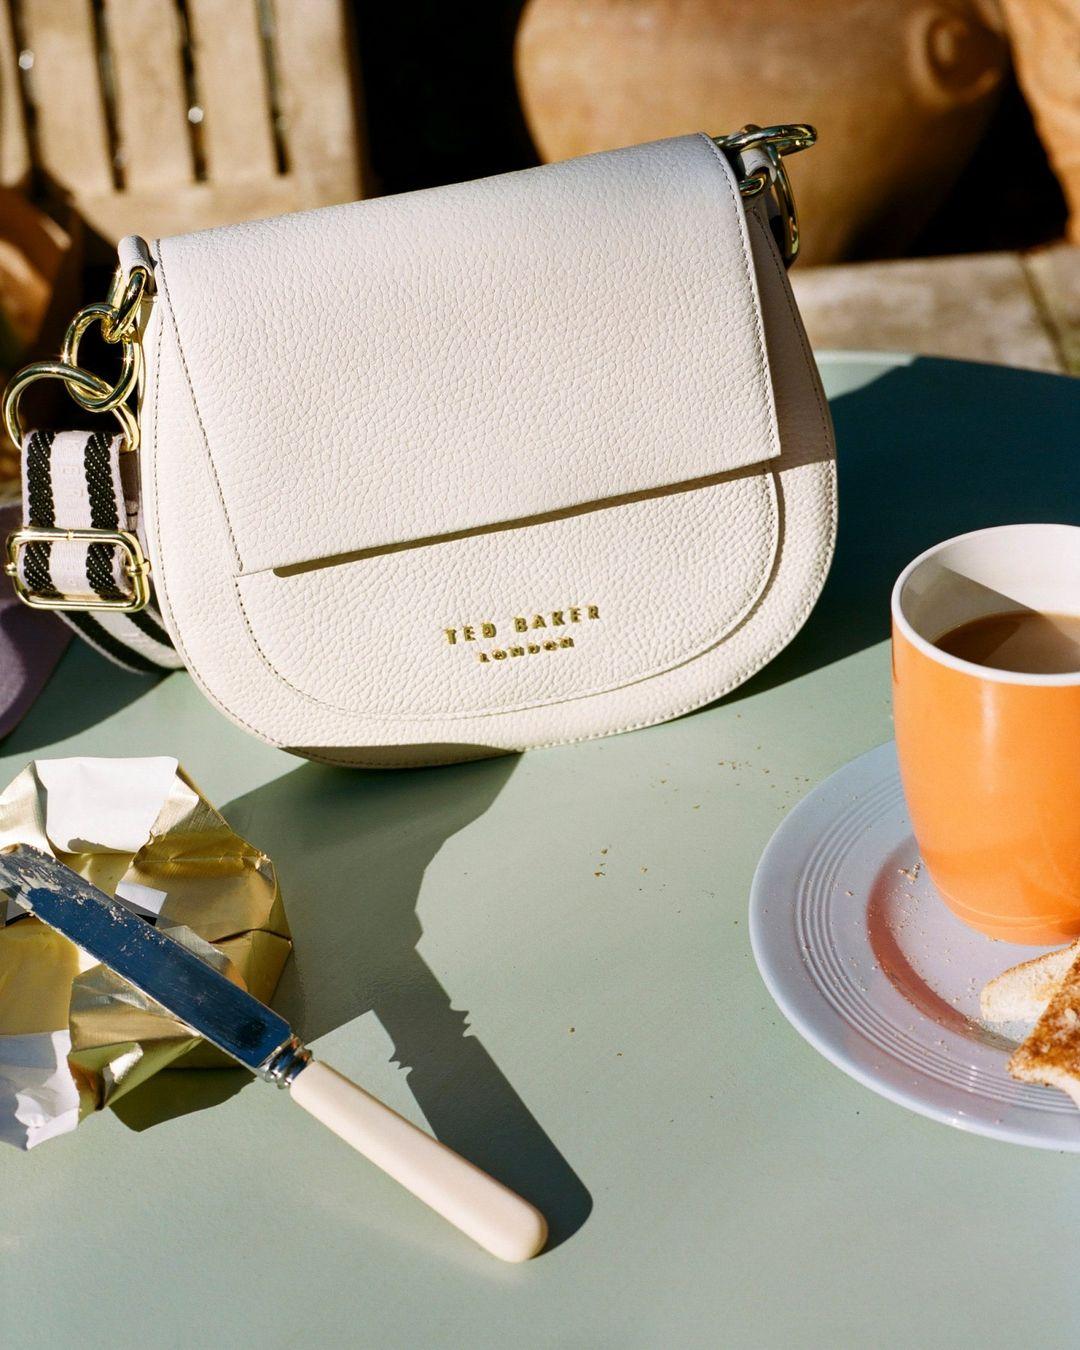 Ted Baker bag on a restaurant table